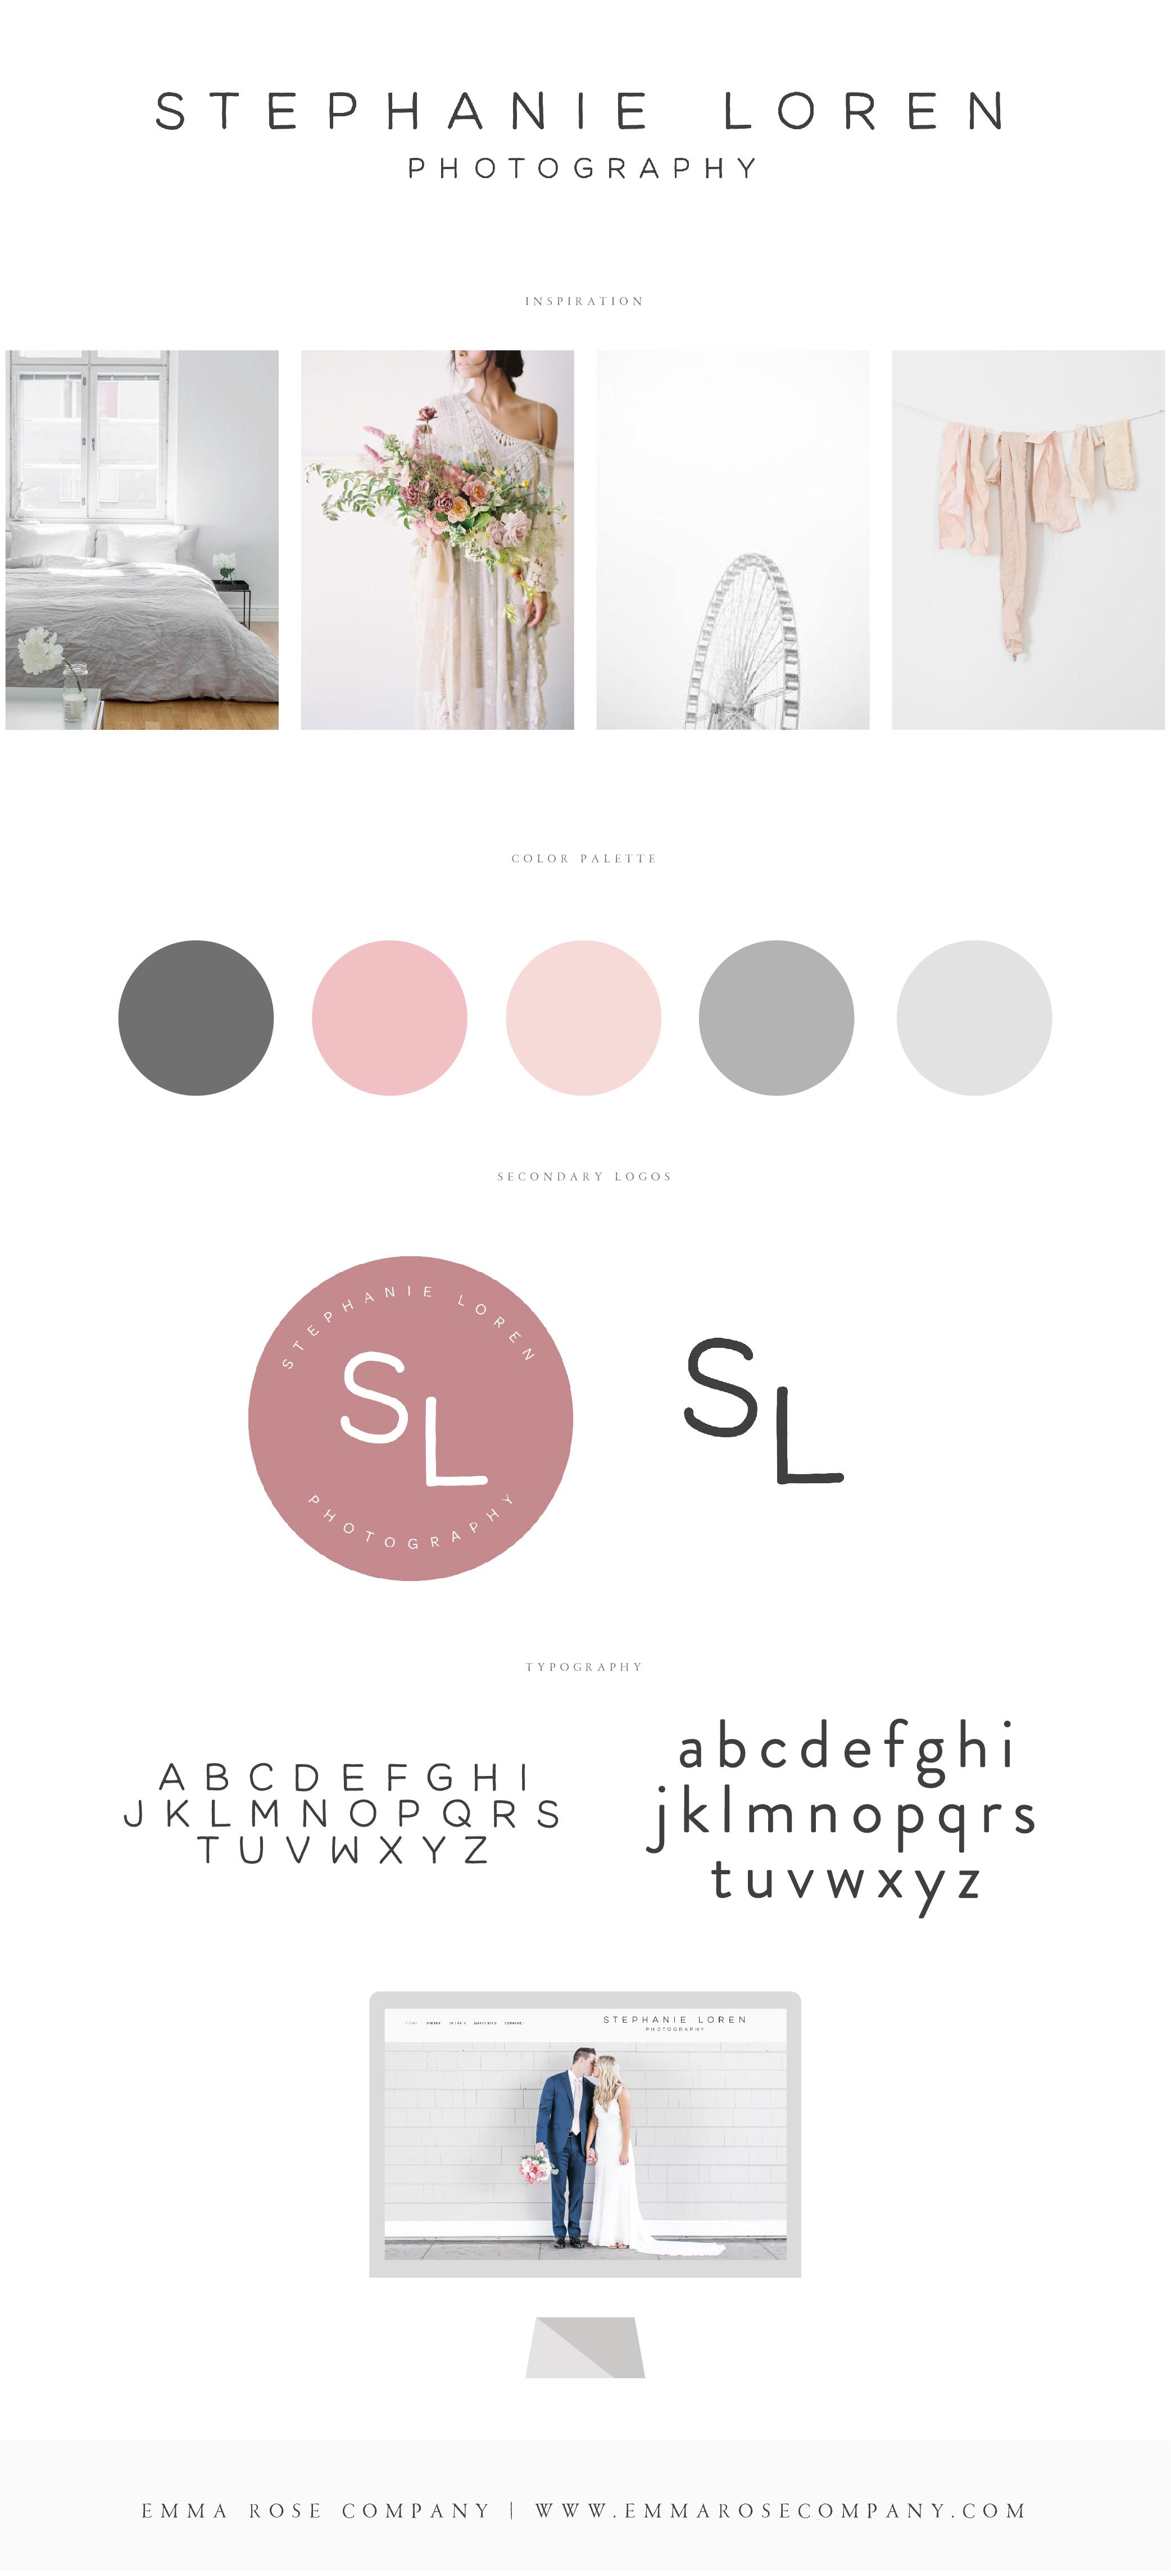 Stephanie Loren Project Showcase_Brand Board-02.jpg